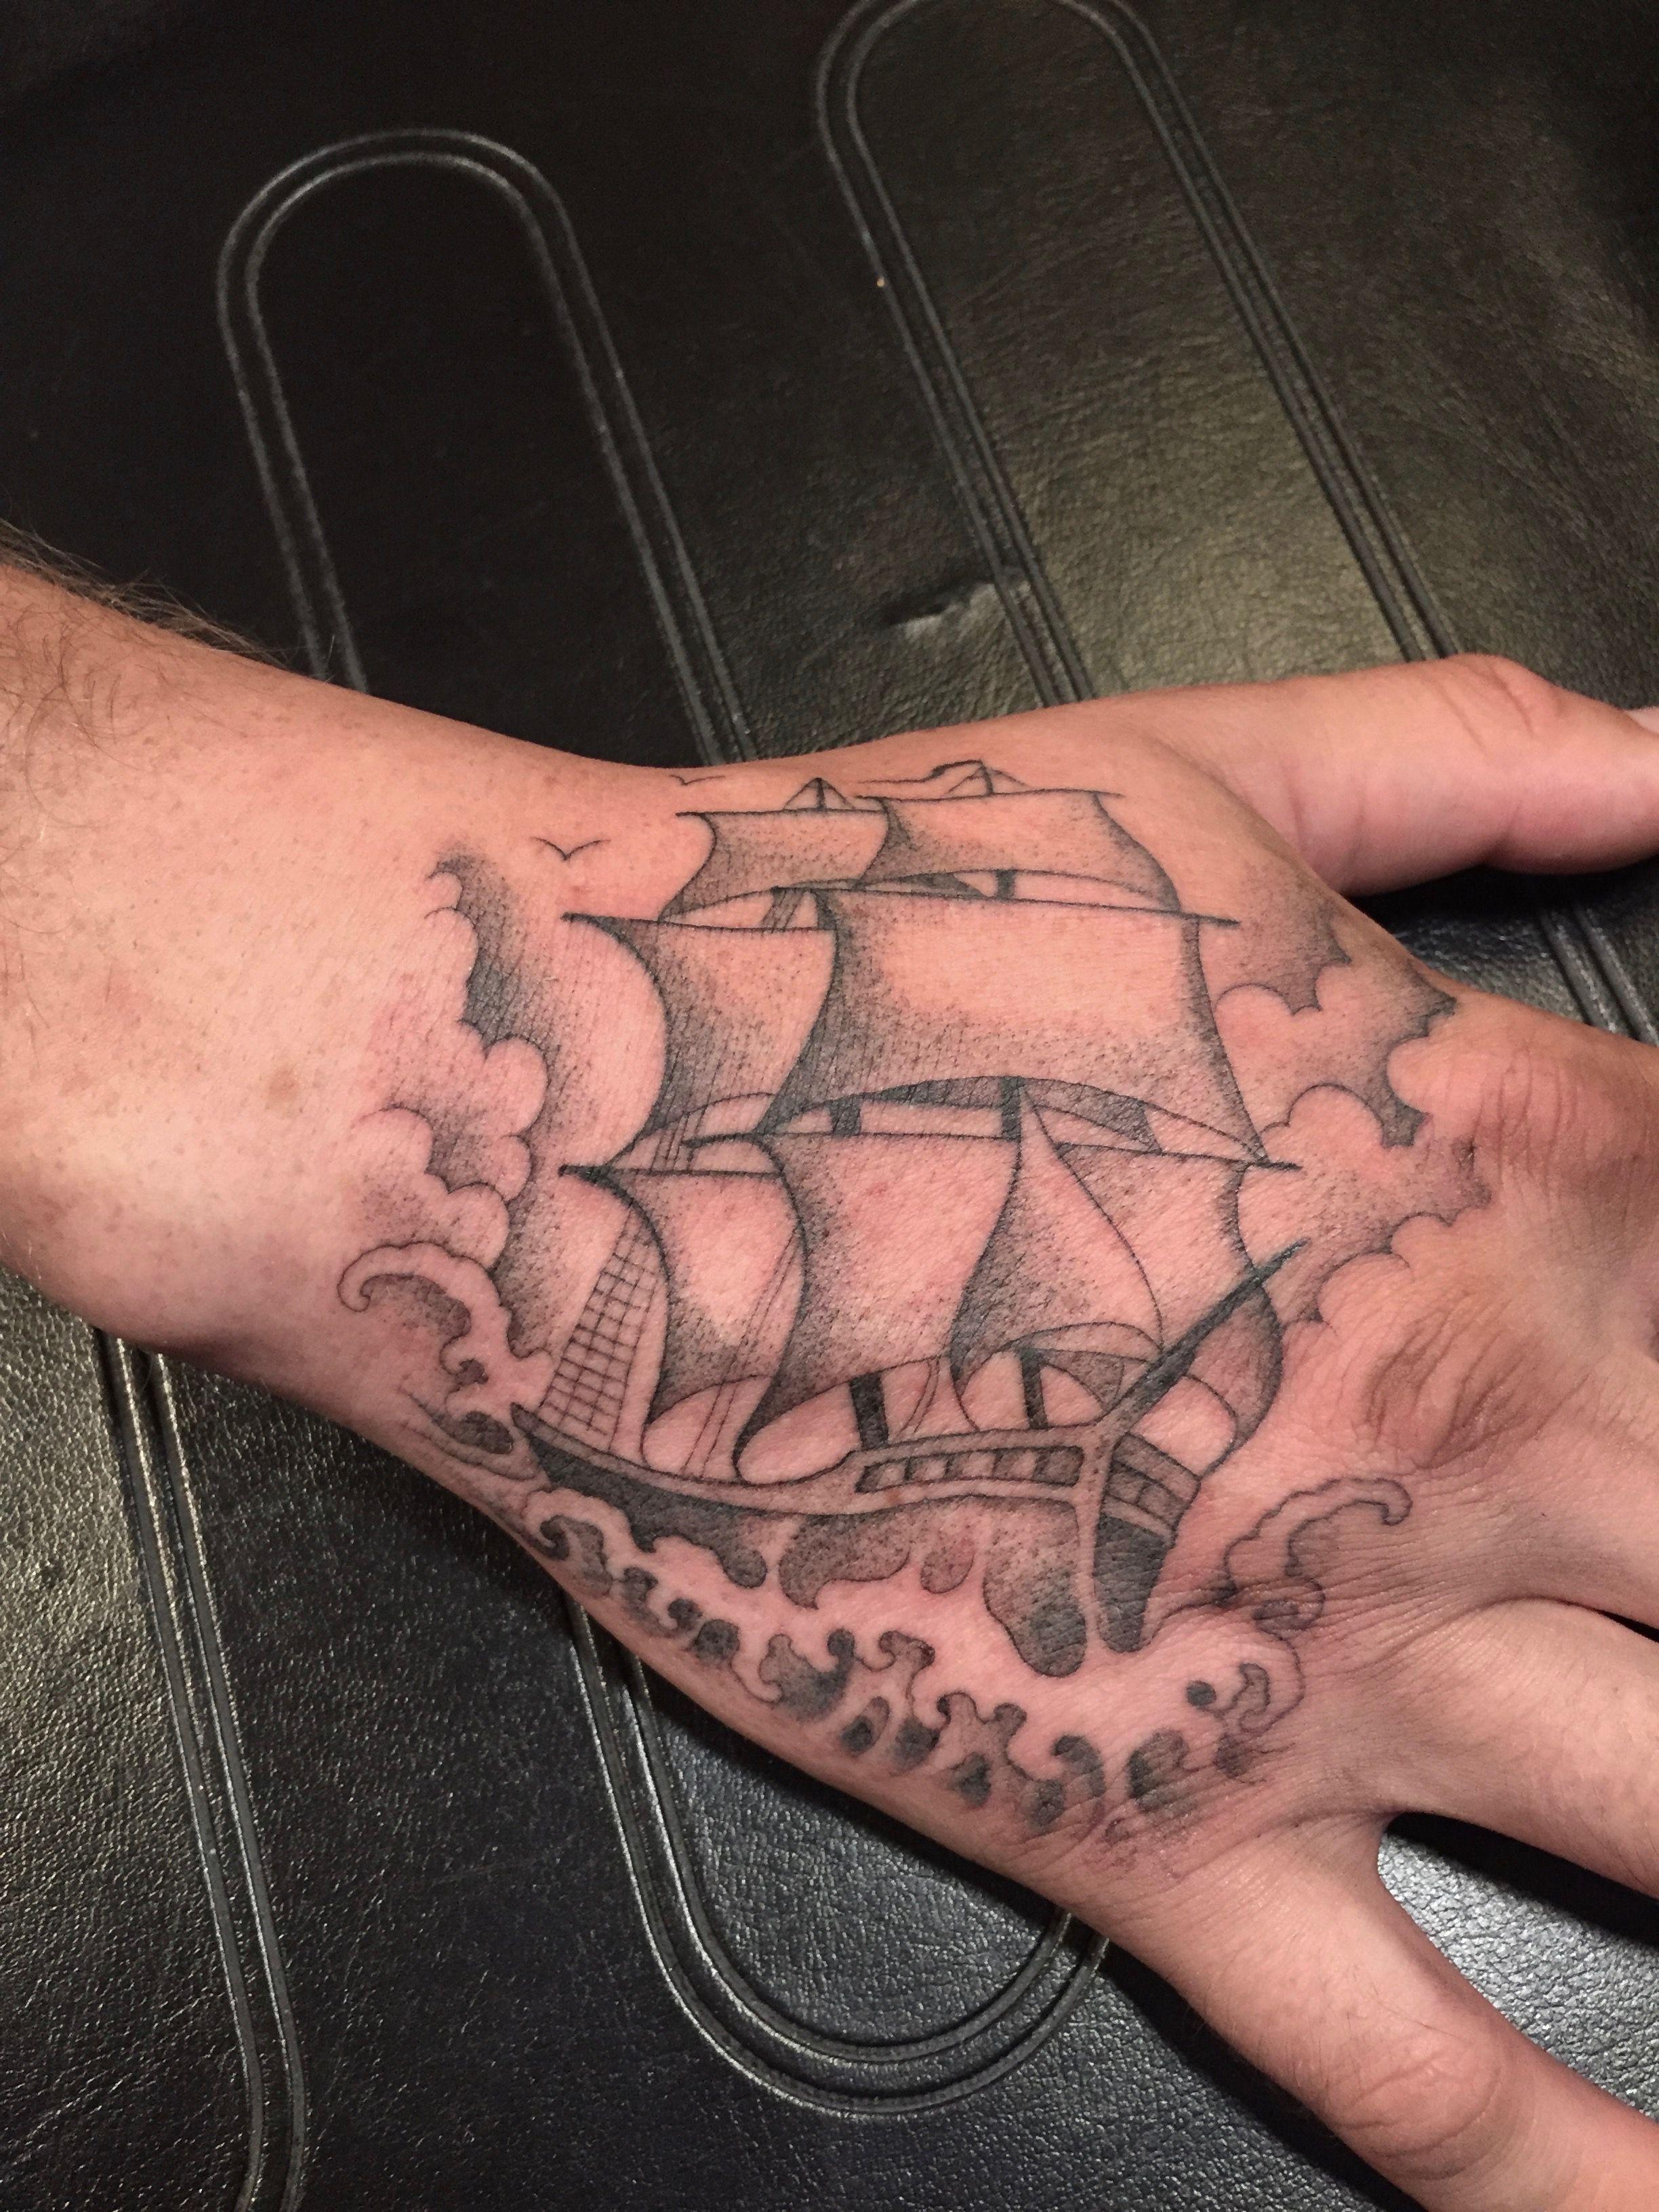 Black and gray stipple single needle ship hand tattoo by Jason Metka Medford Oregon #medfordoregontattoos #medfordtattoos #southernoregontattoos #handtattoos #blackandgraytattoos #blackandgreytattoos #singleneedletattoos #stippletattoos